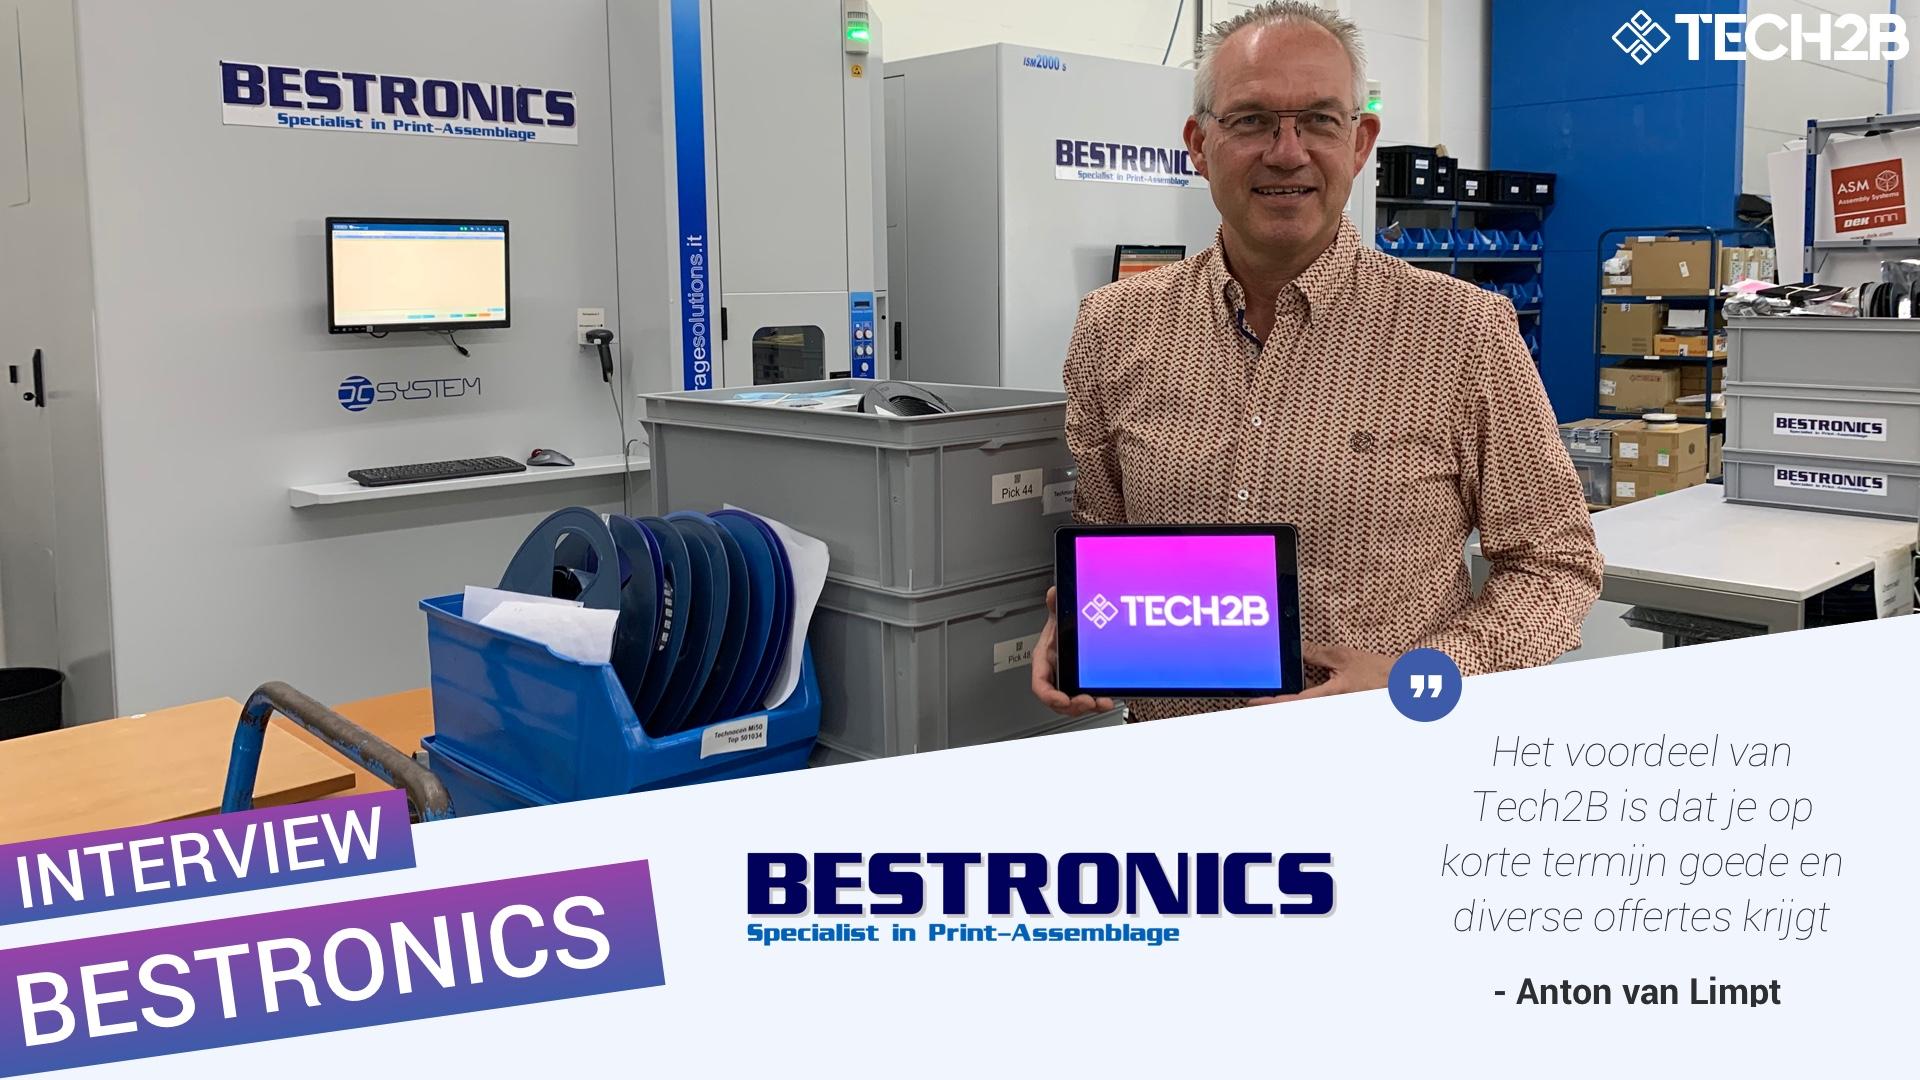 Anton van Limpt - Bestronics - Succesformule Tech2B - Supply Chain - Inkoopplatform